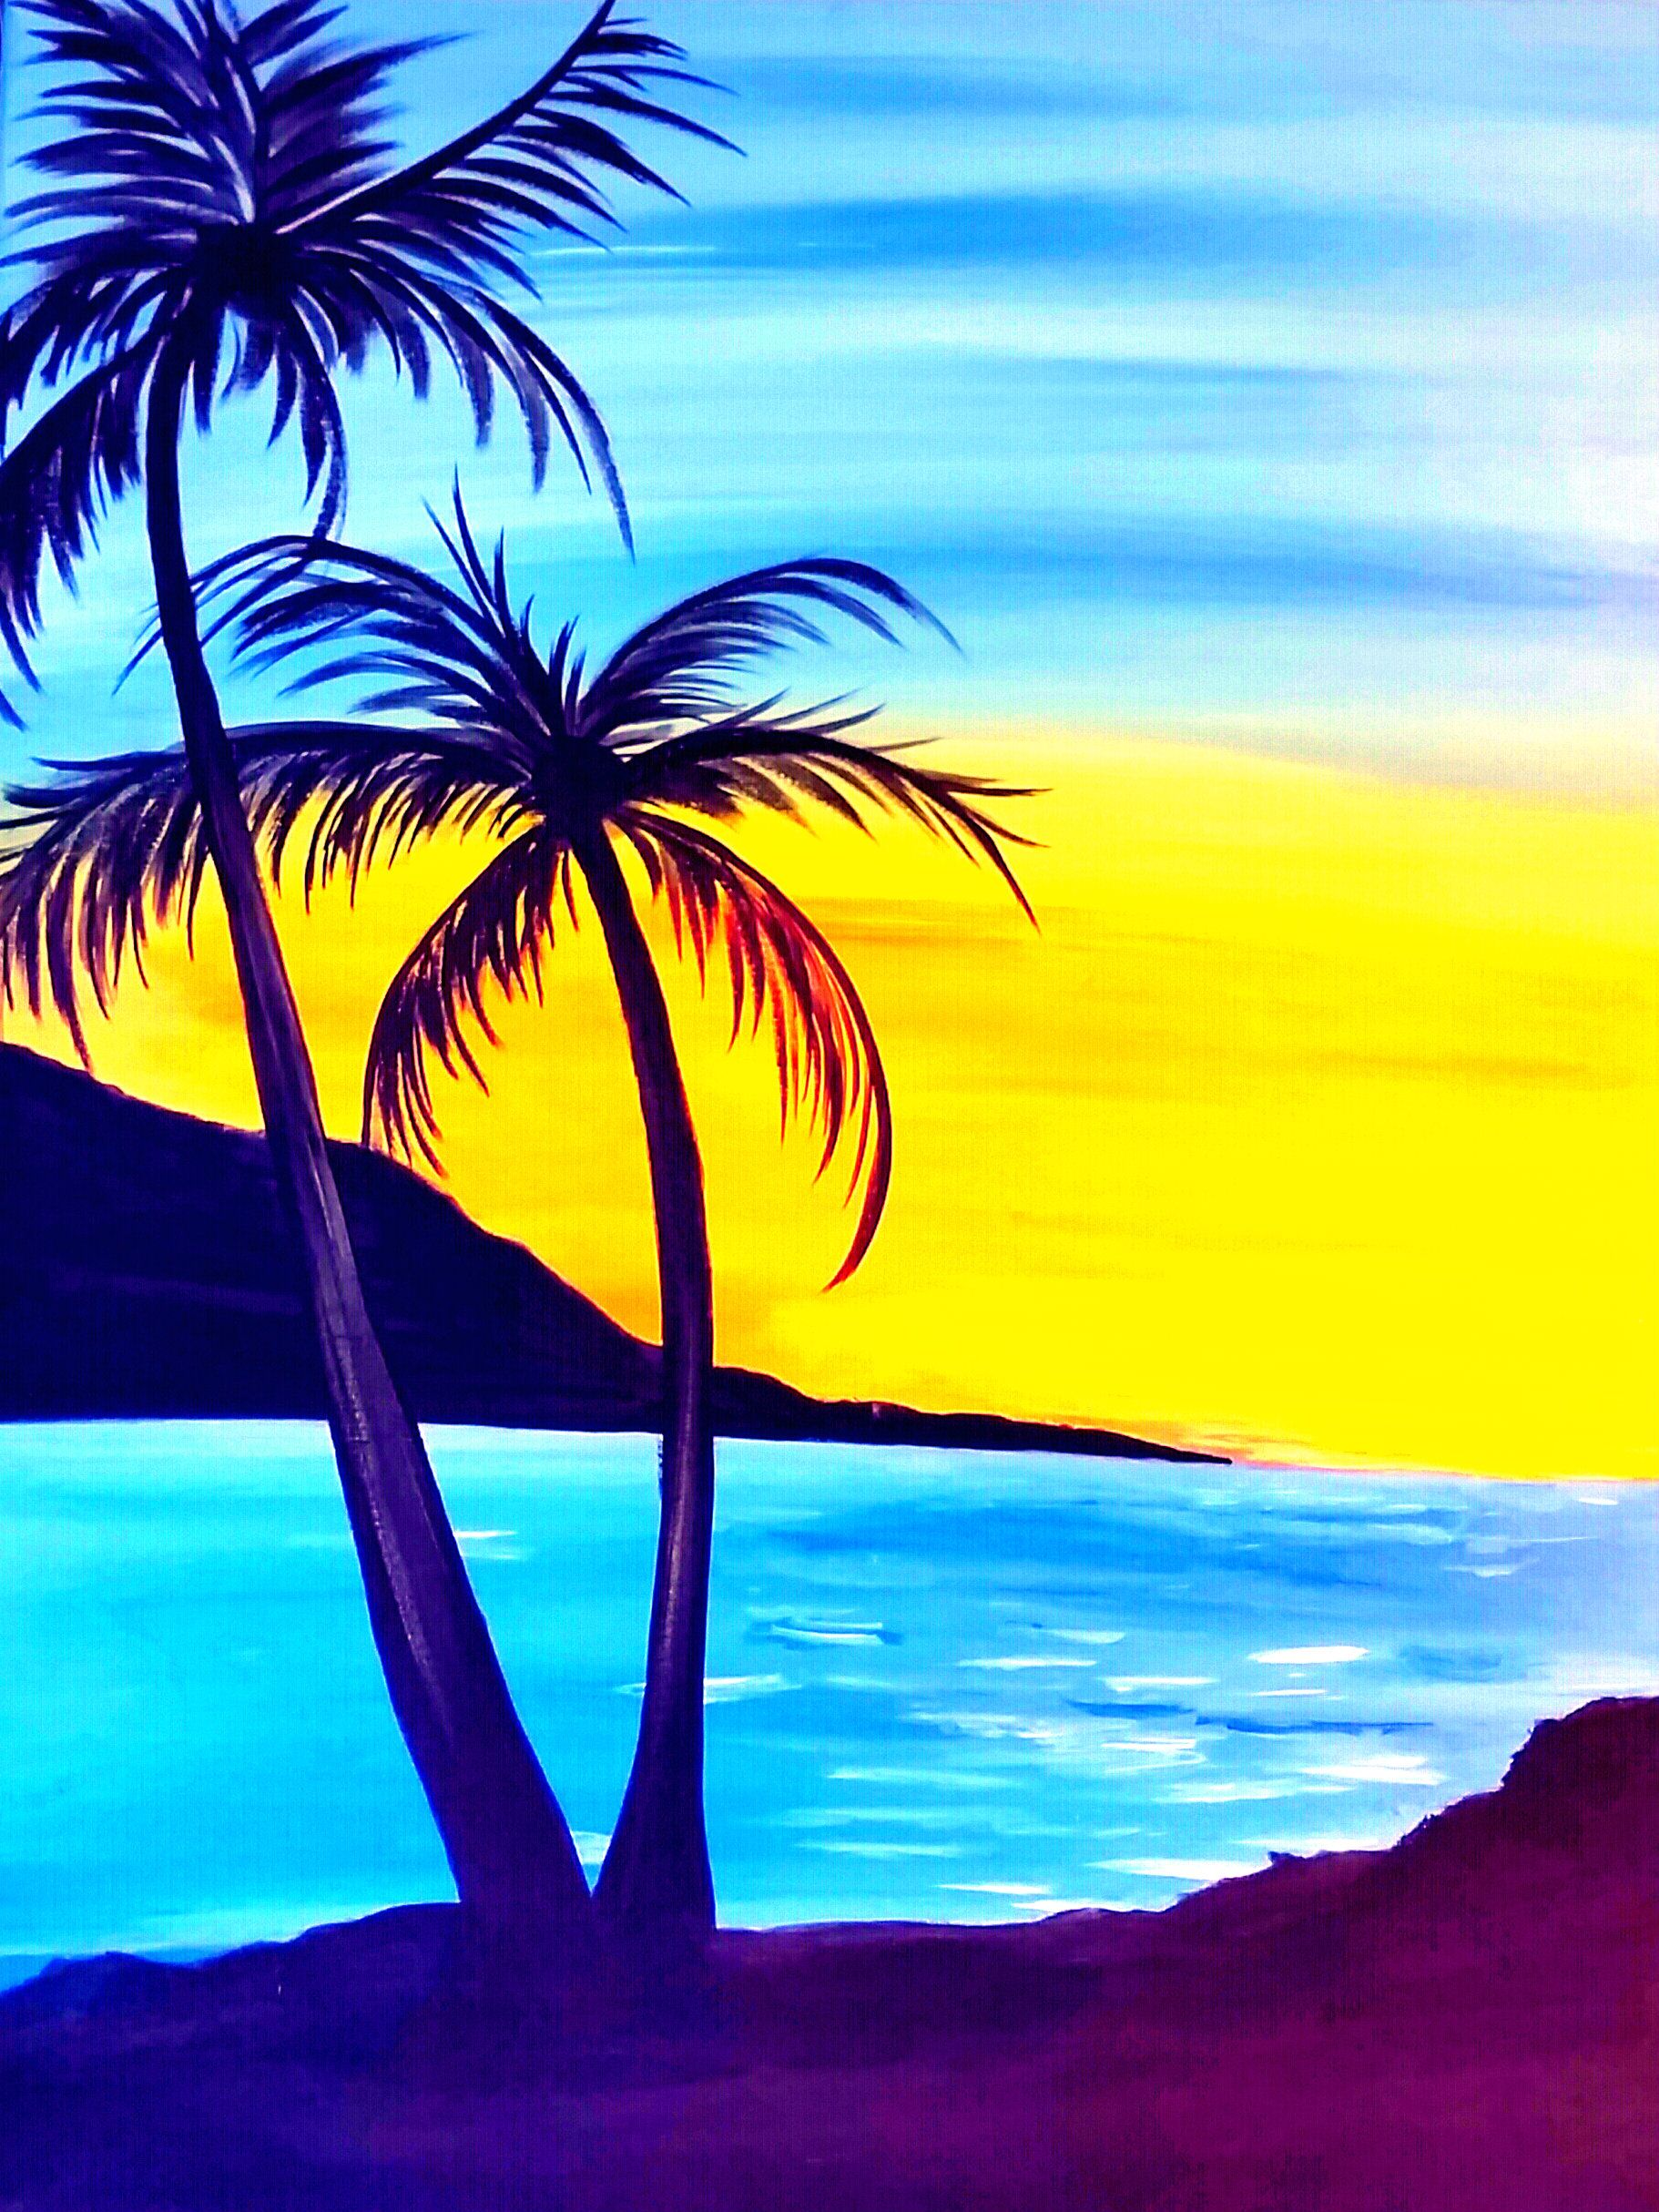 BEACH UMBRELLA ILLUMINATION by Mikaela McLeish # ... Easy Beach Sunset Paintings